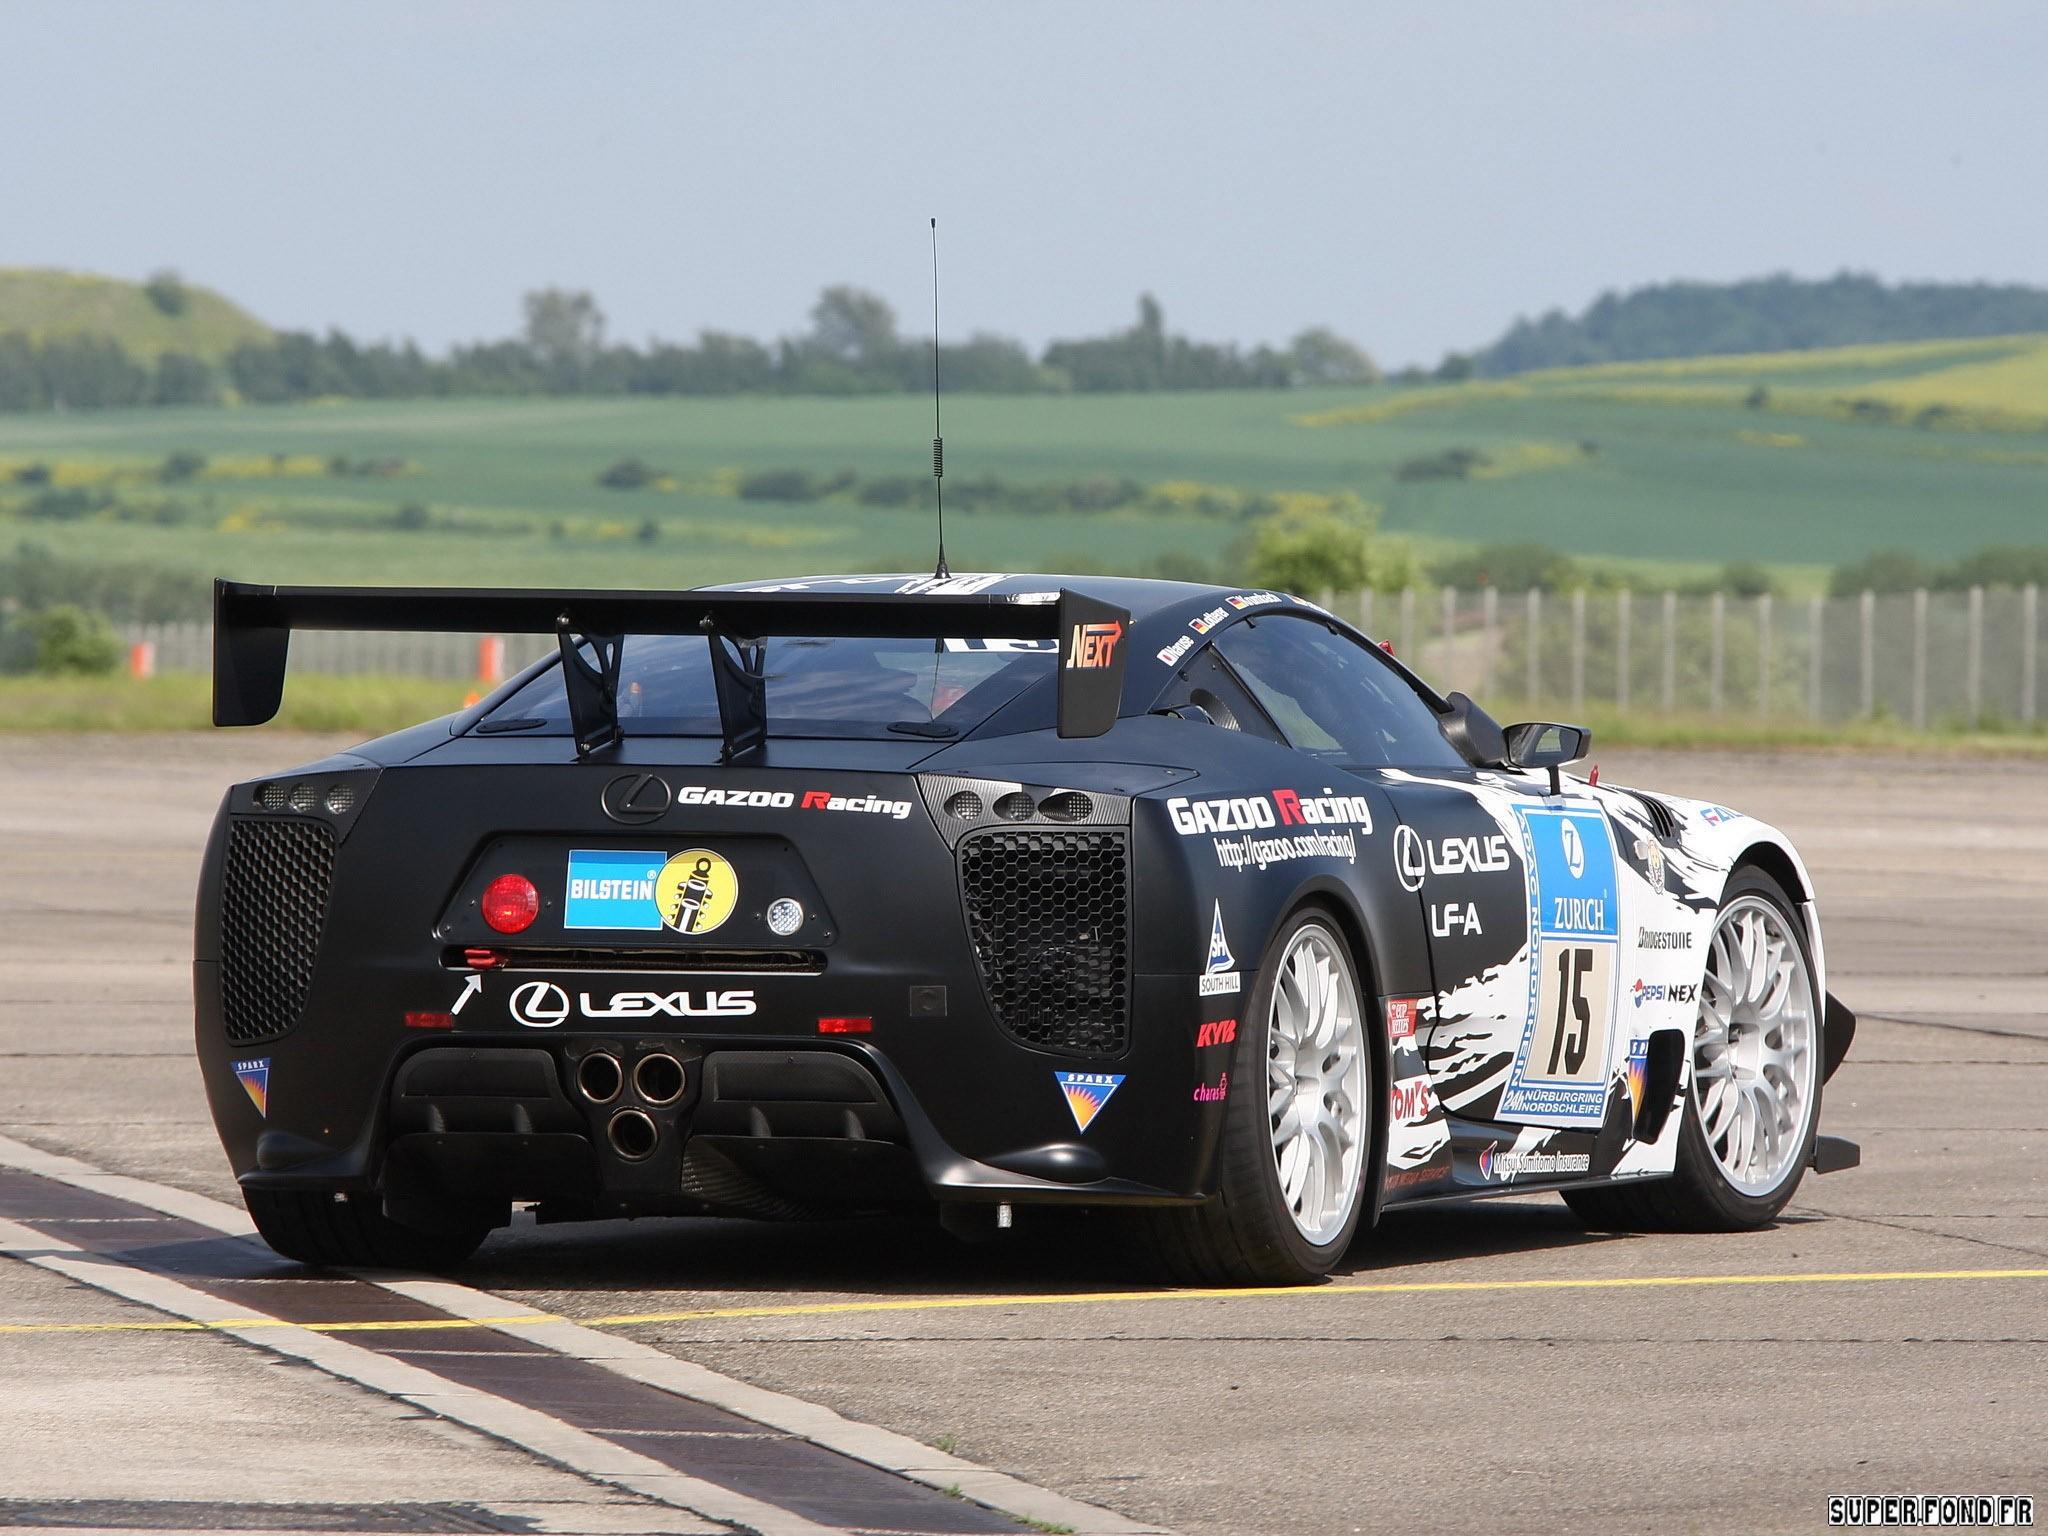 2009 Lexus LF-A Race Car